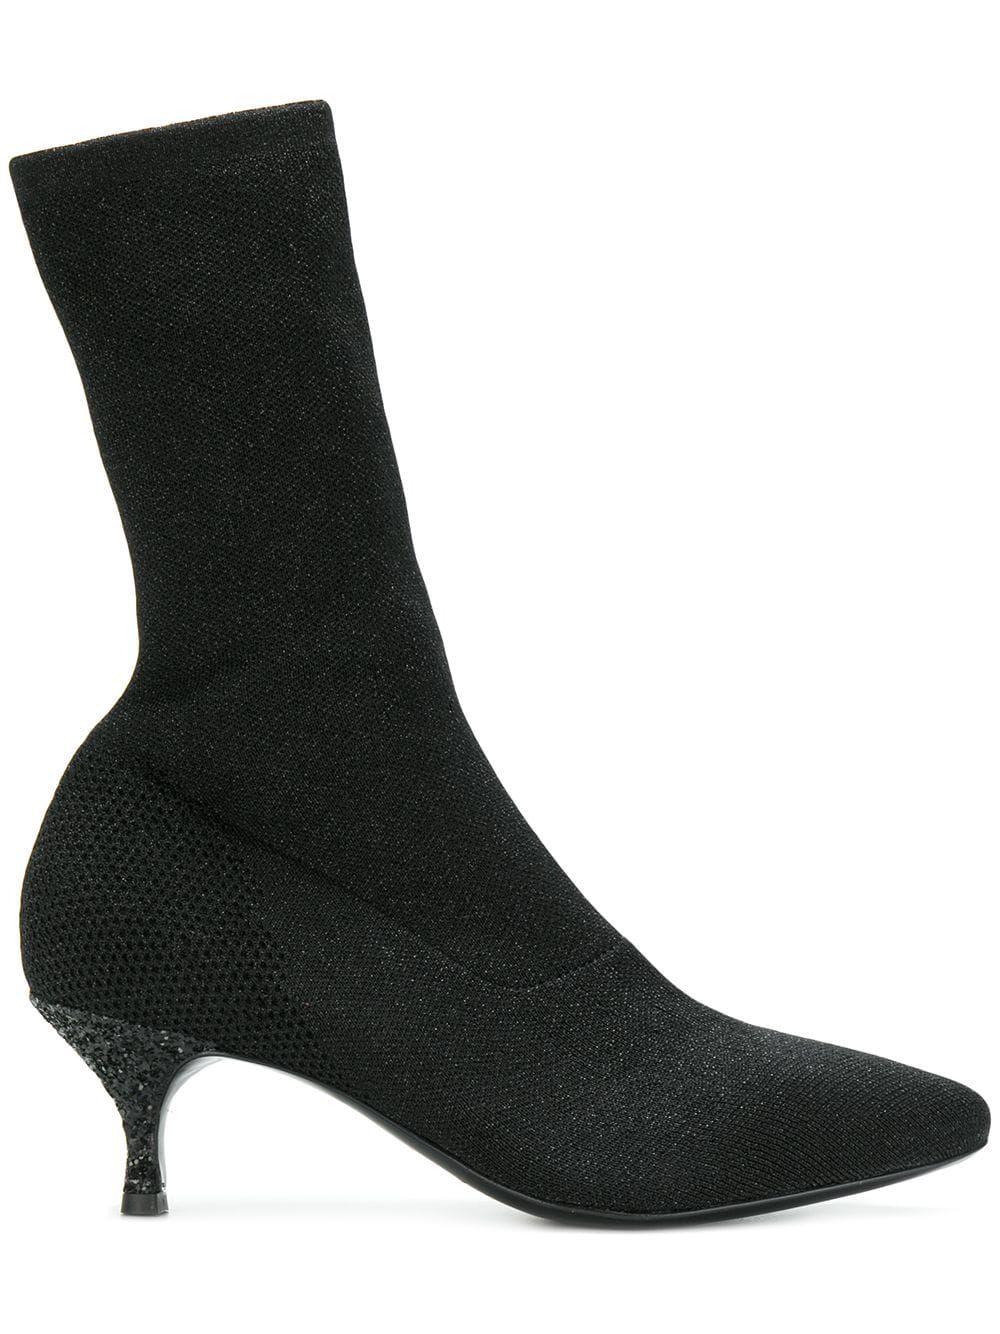 Strategia Kitten Heel Sock Boots Socks Heels Boots Kitten Heels